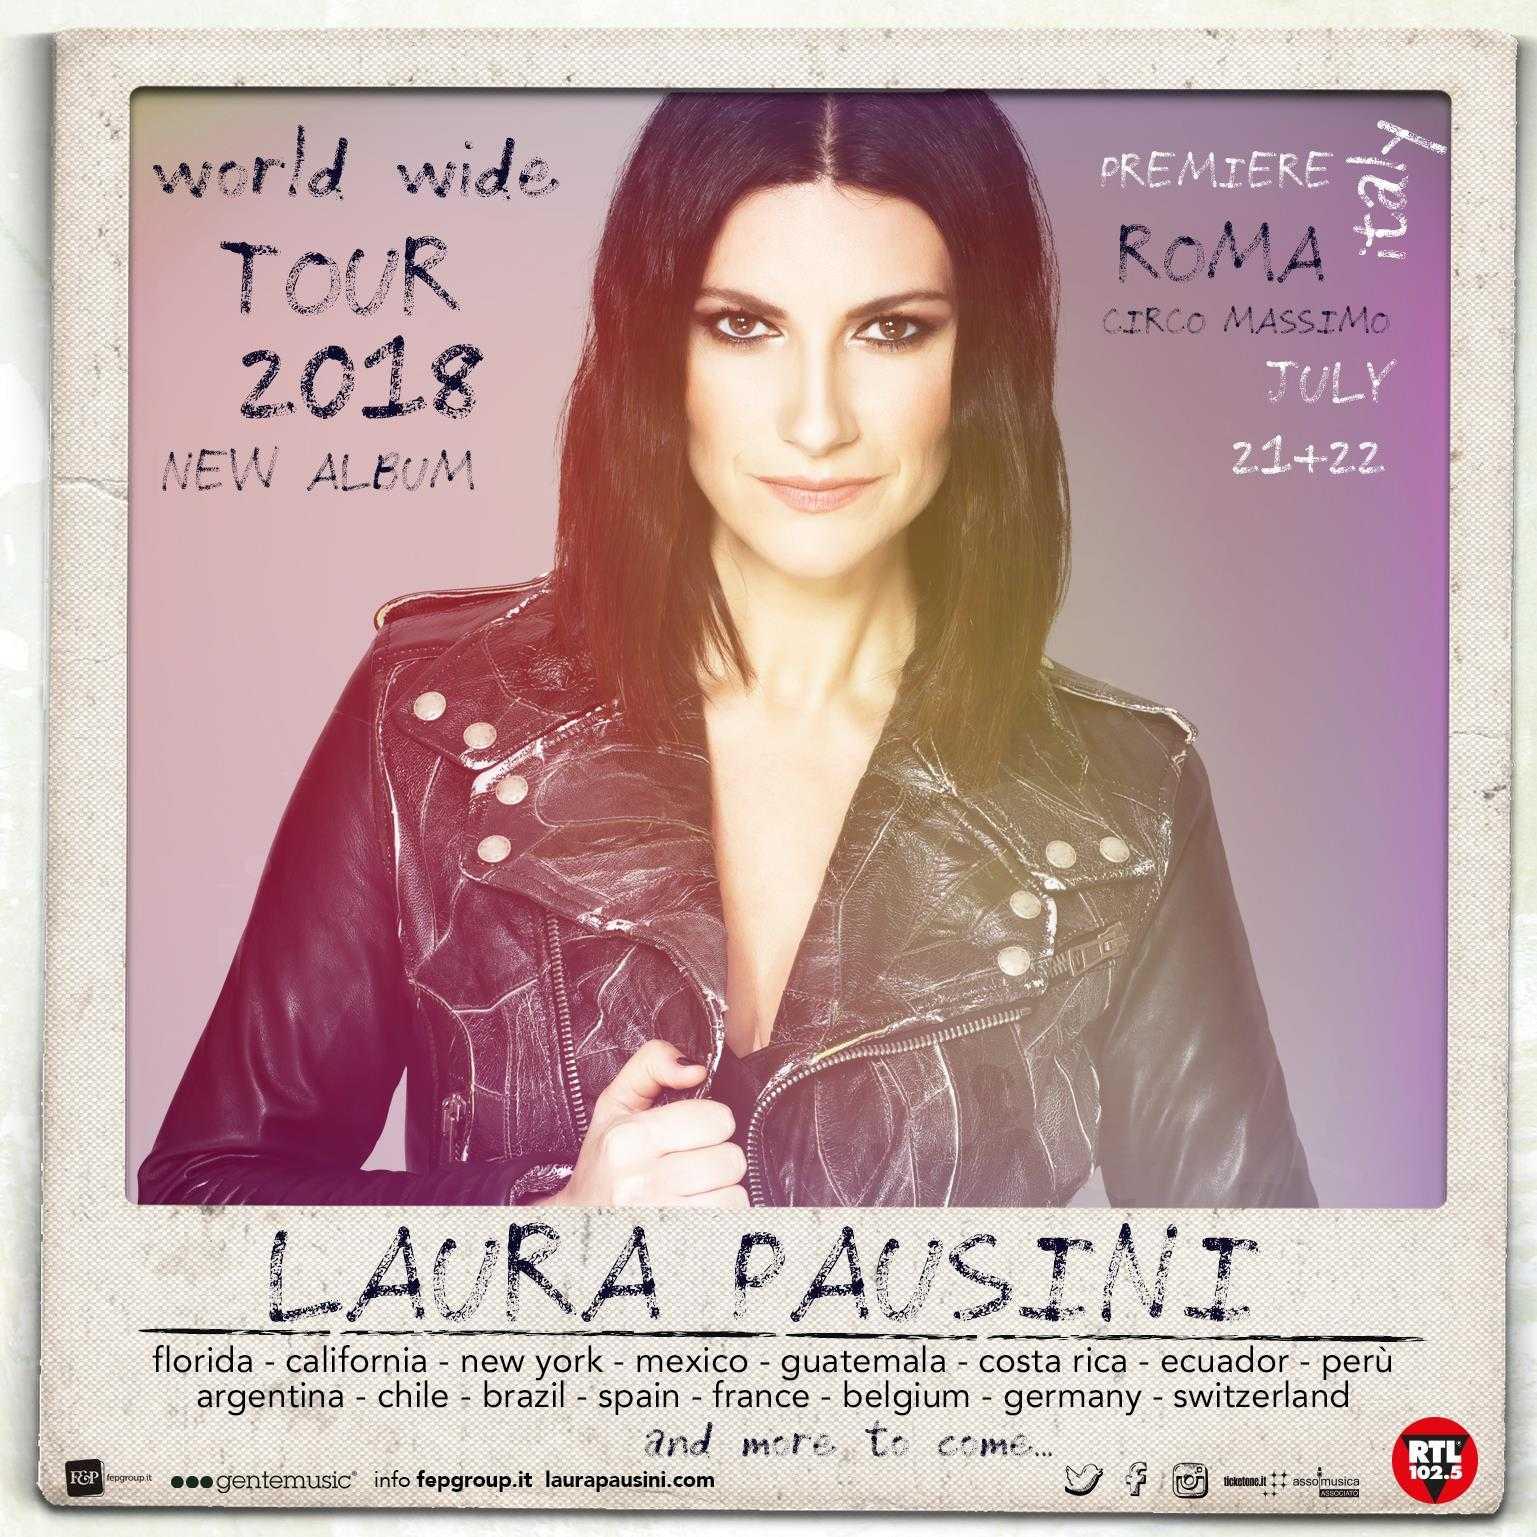 laura pausini new album tour world circo massimo